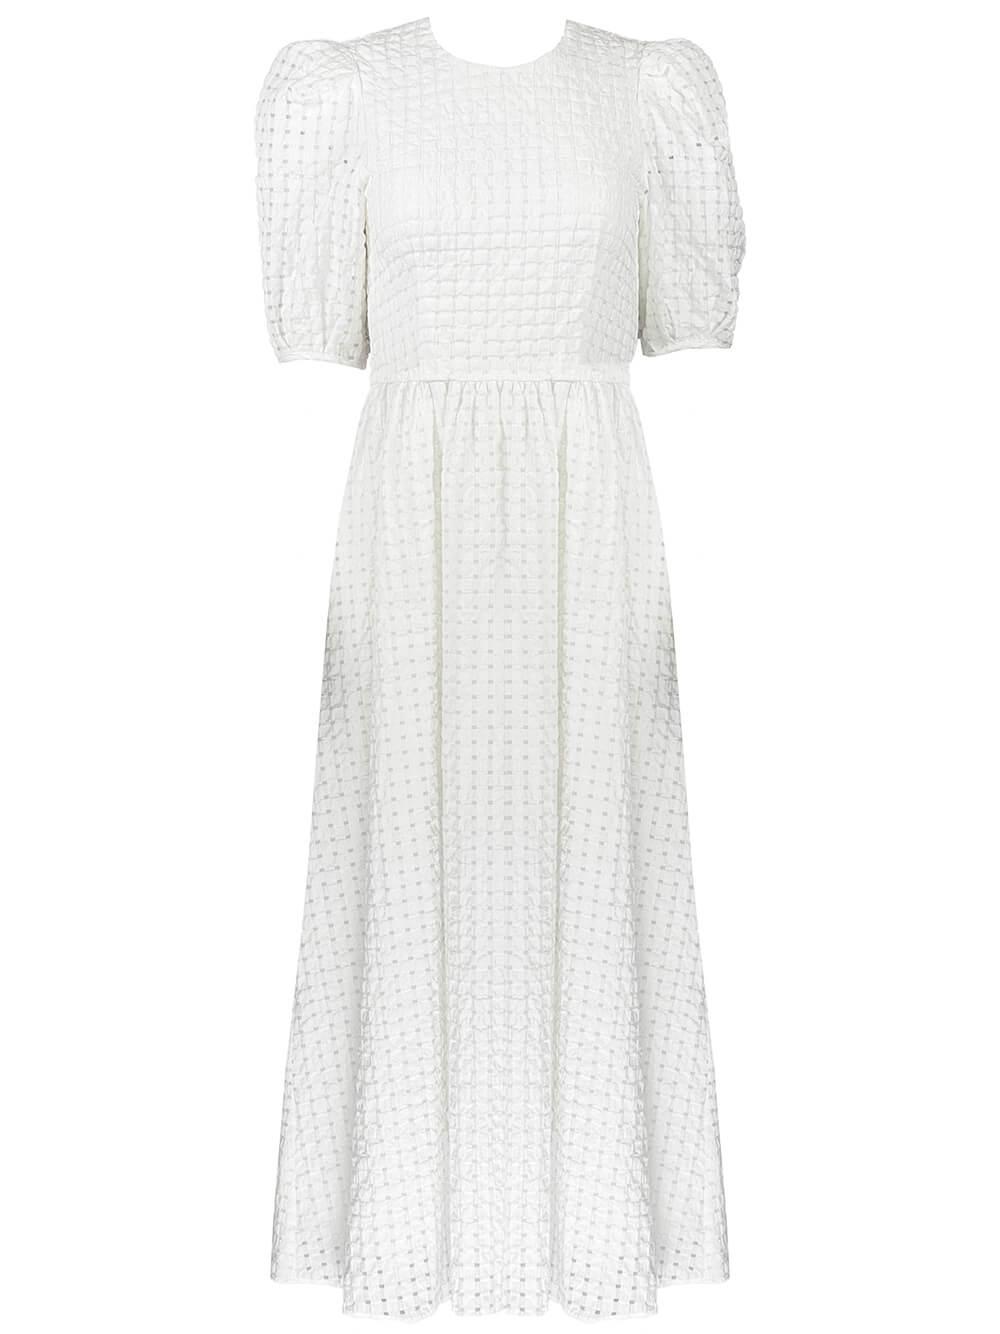 Rowan Seersucker Dress Item # 21SPD33